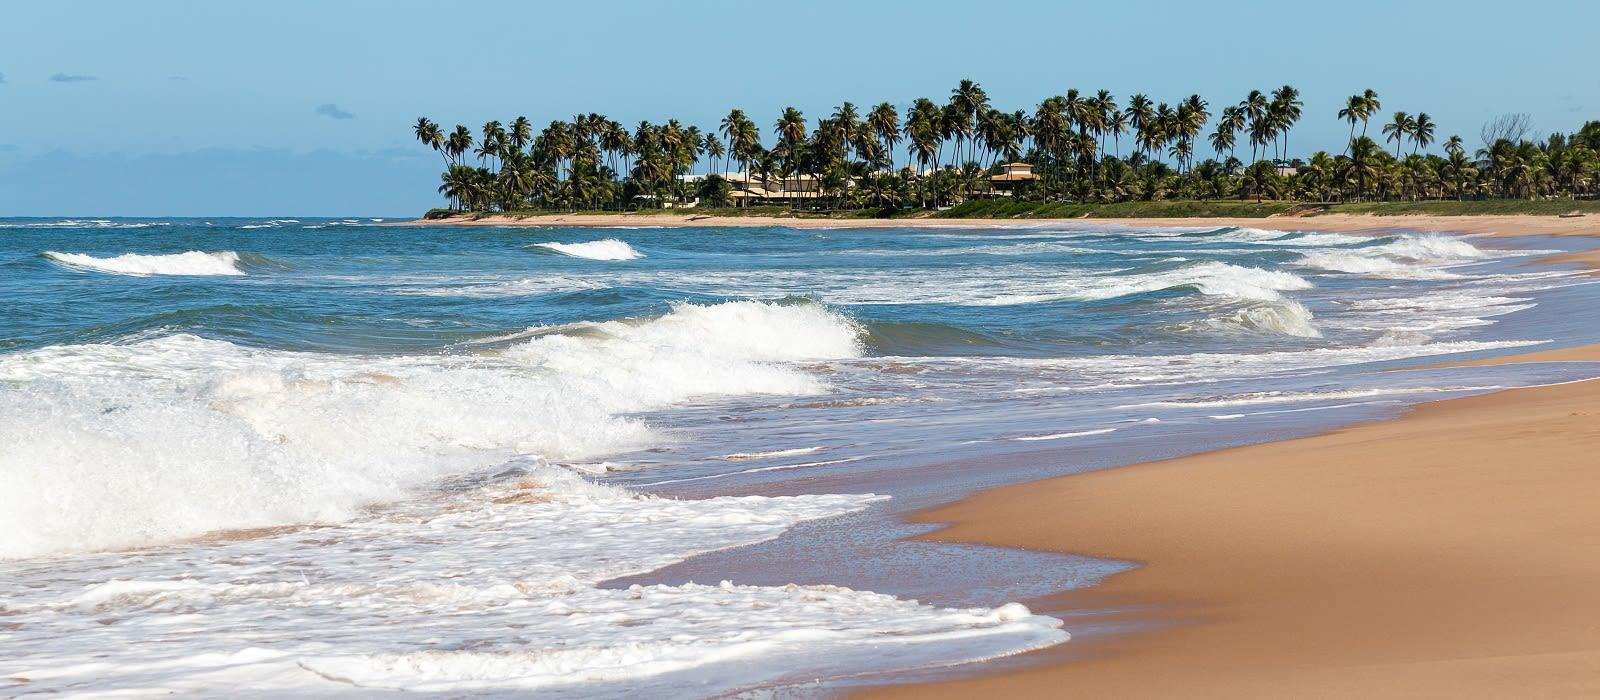 Brazil's Big Cities, Nature and Beach Tour Trip 5